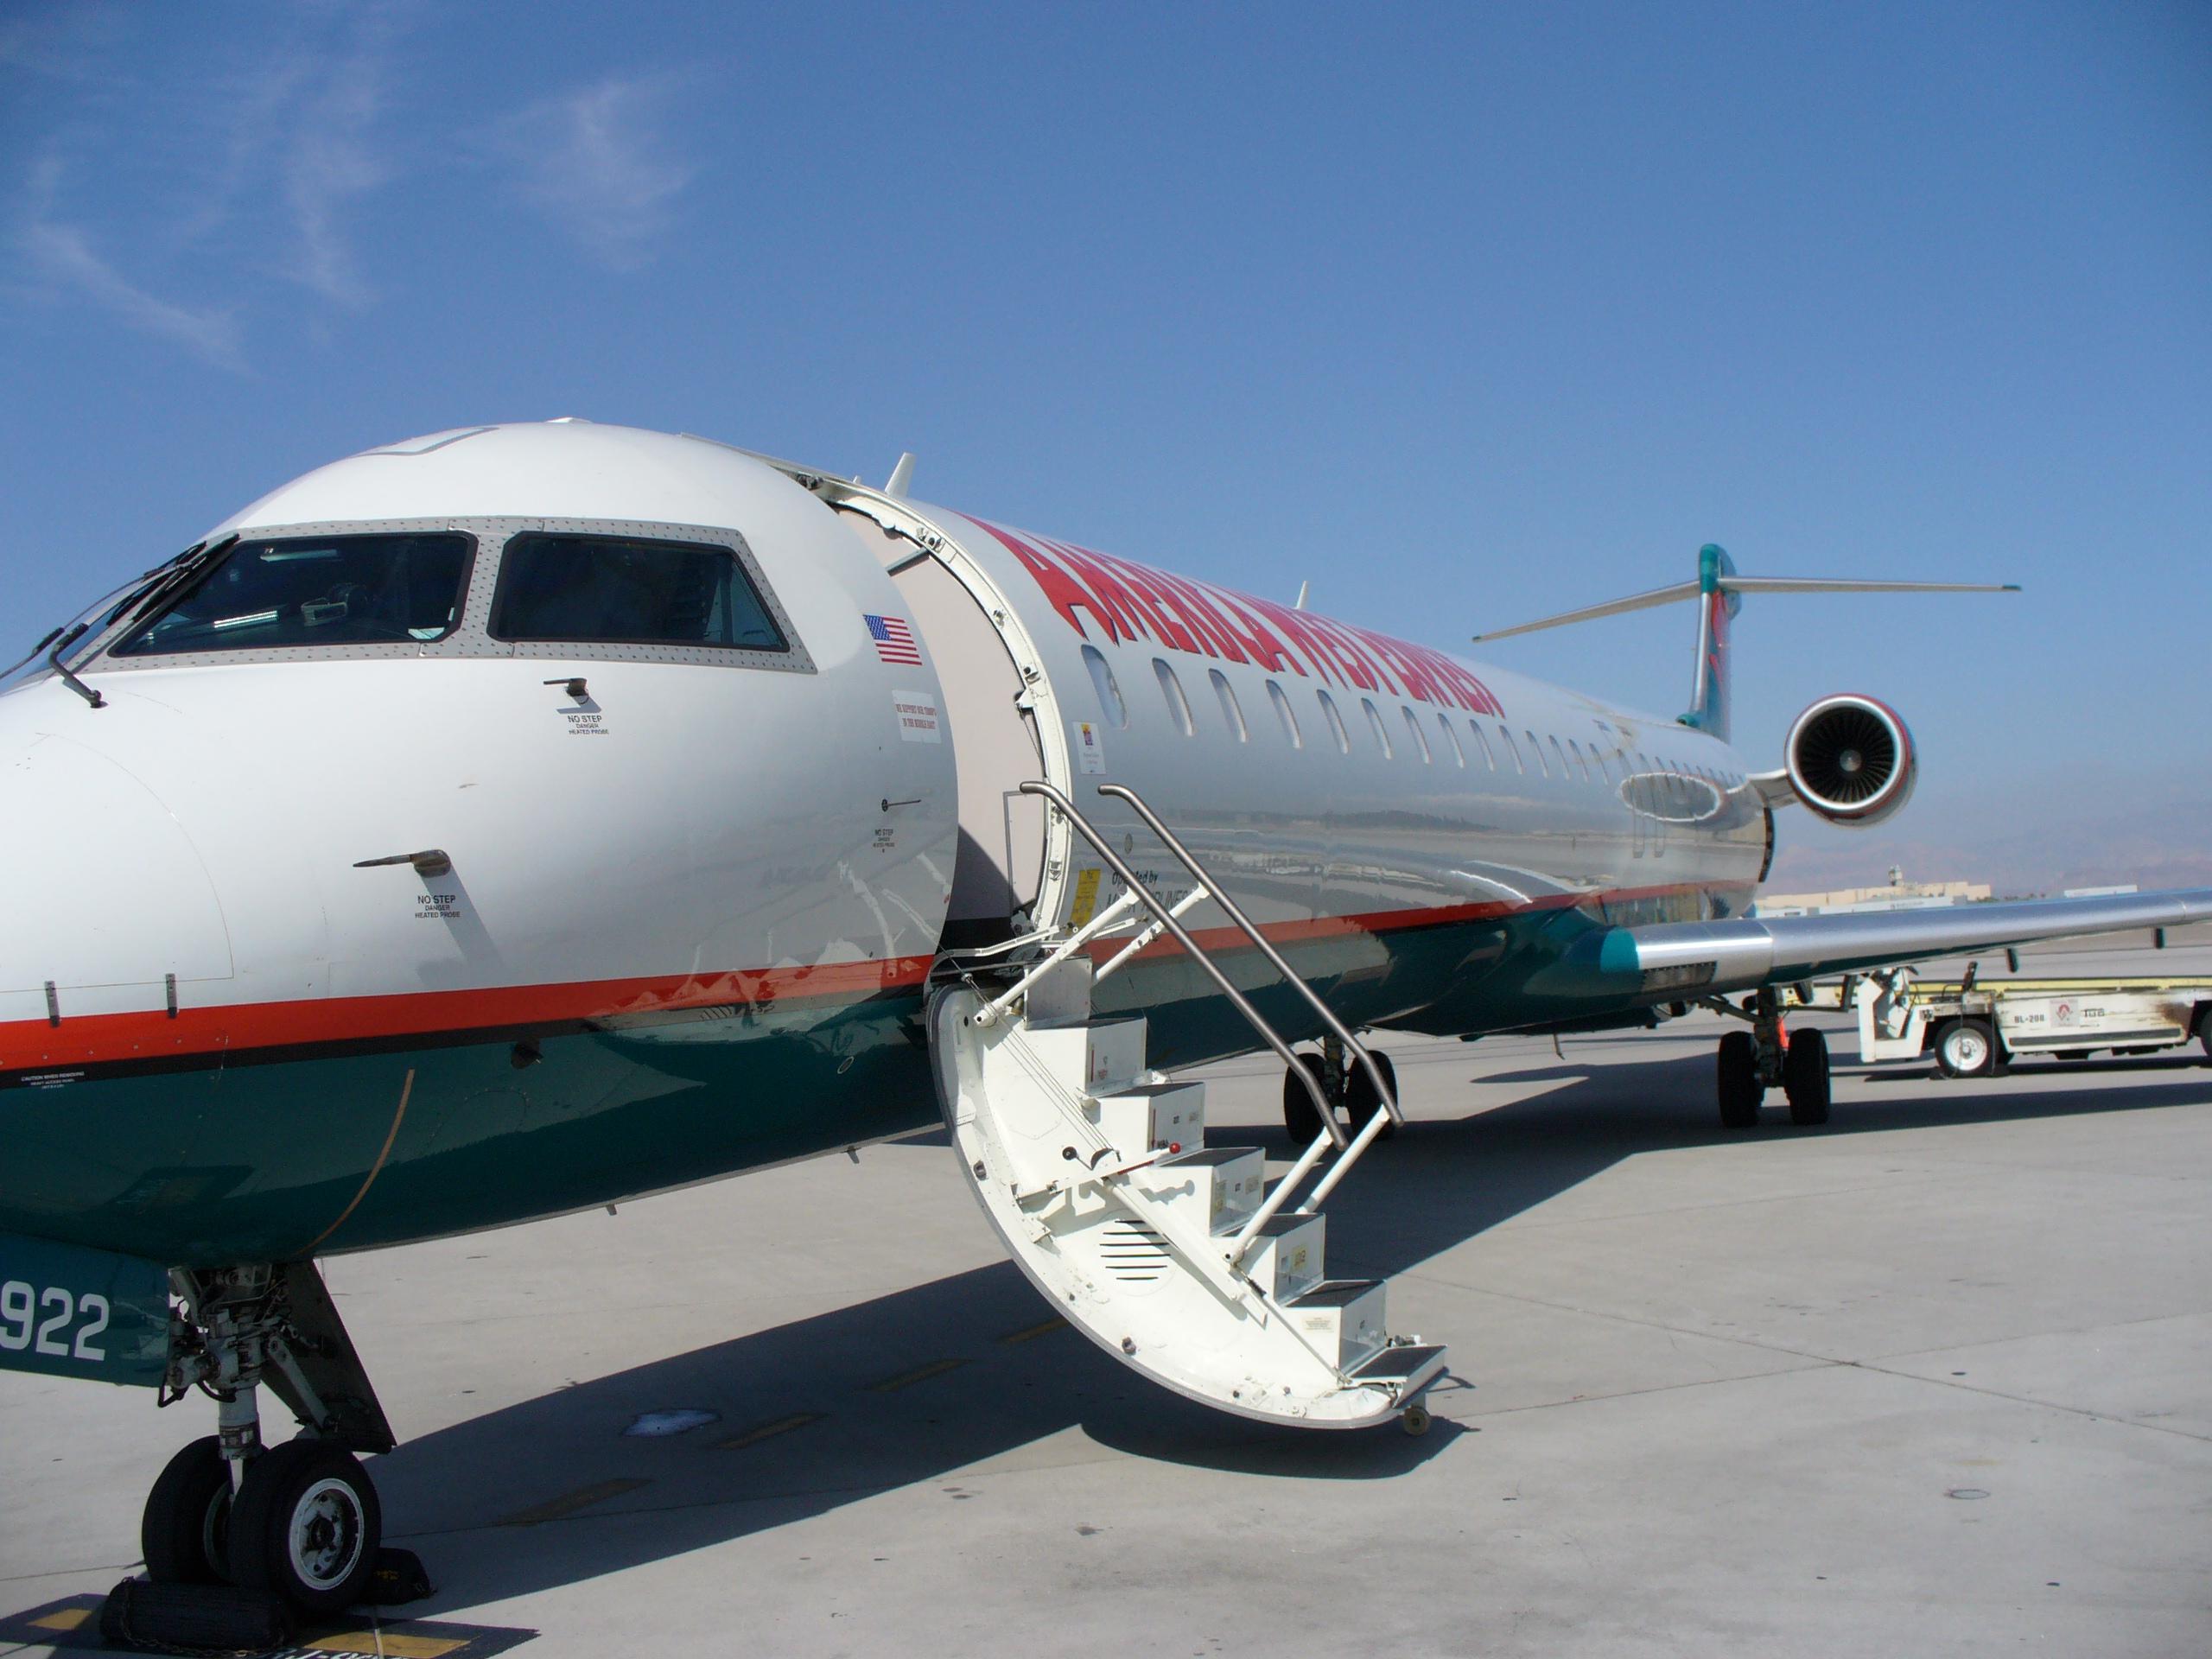 FileBombardier CRJ900LR Mesa Airlines LASjpg